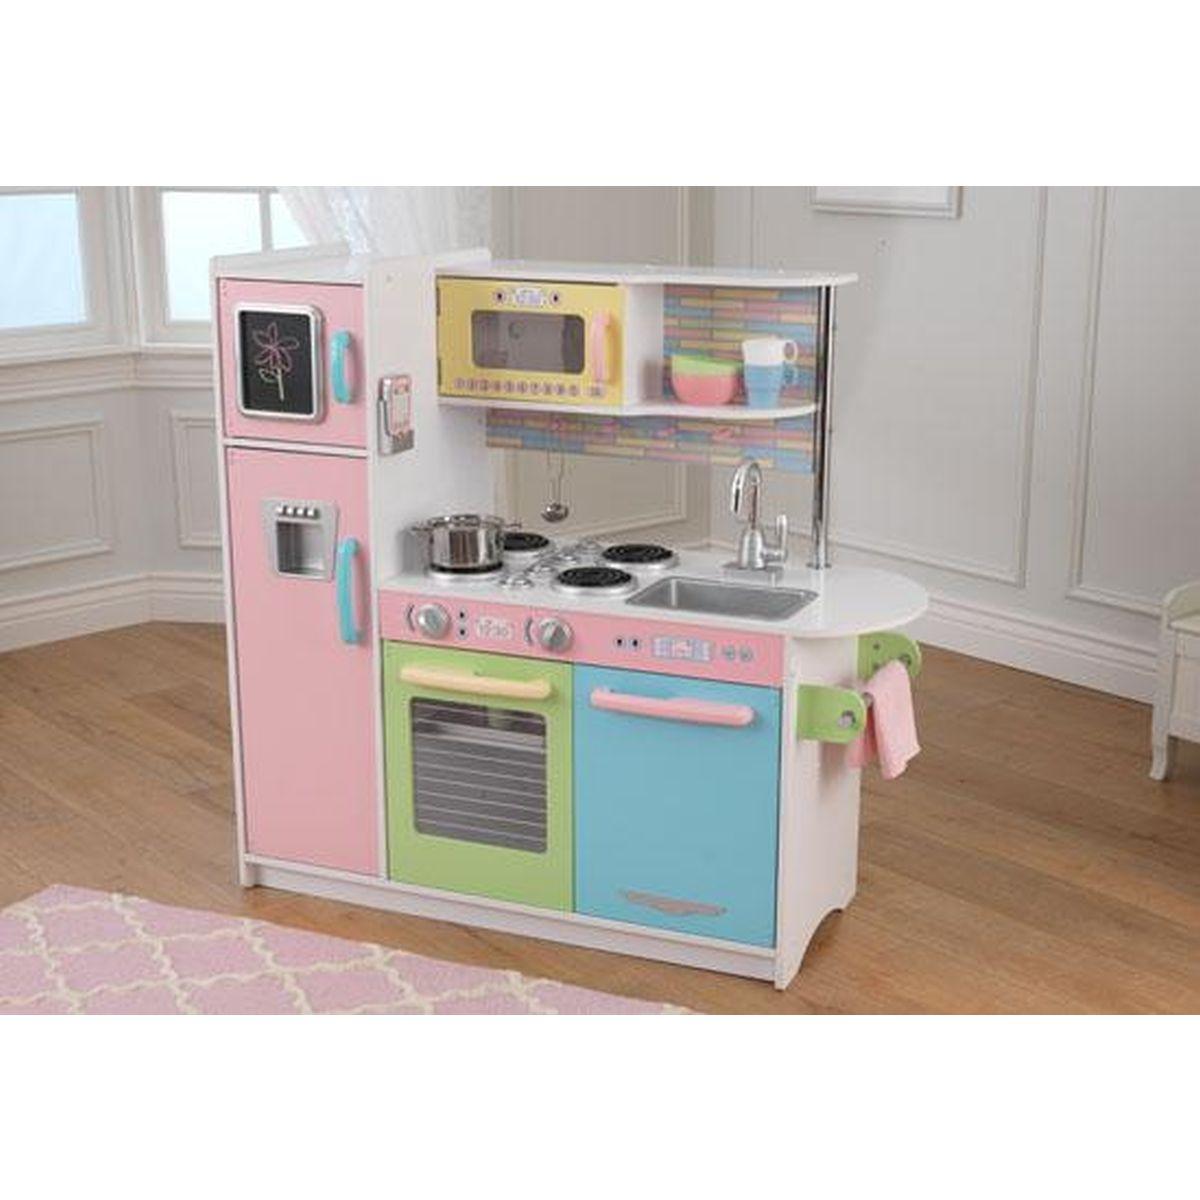 Kidkraft Cuisine Enfant Uptown Pastel 53257